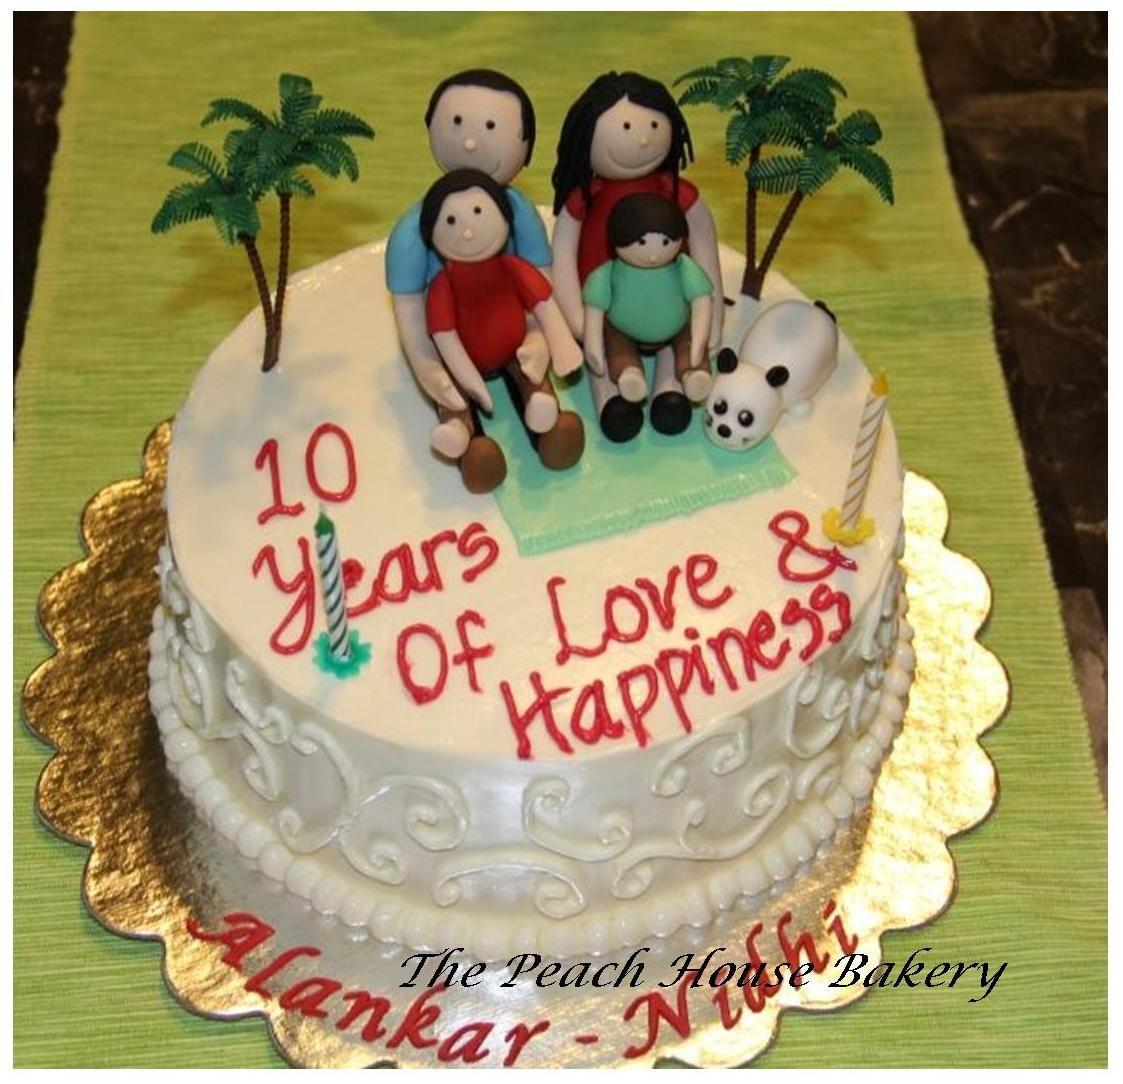 10 Year Wedding Anniversary Cake Ideas 36622